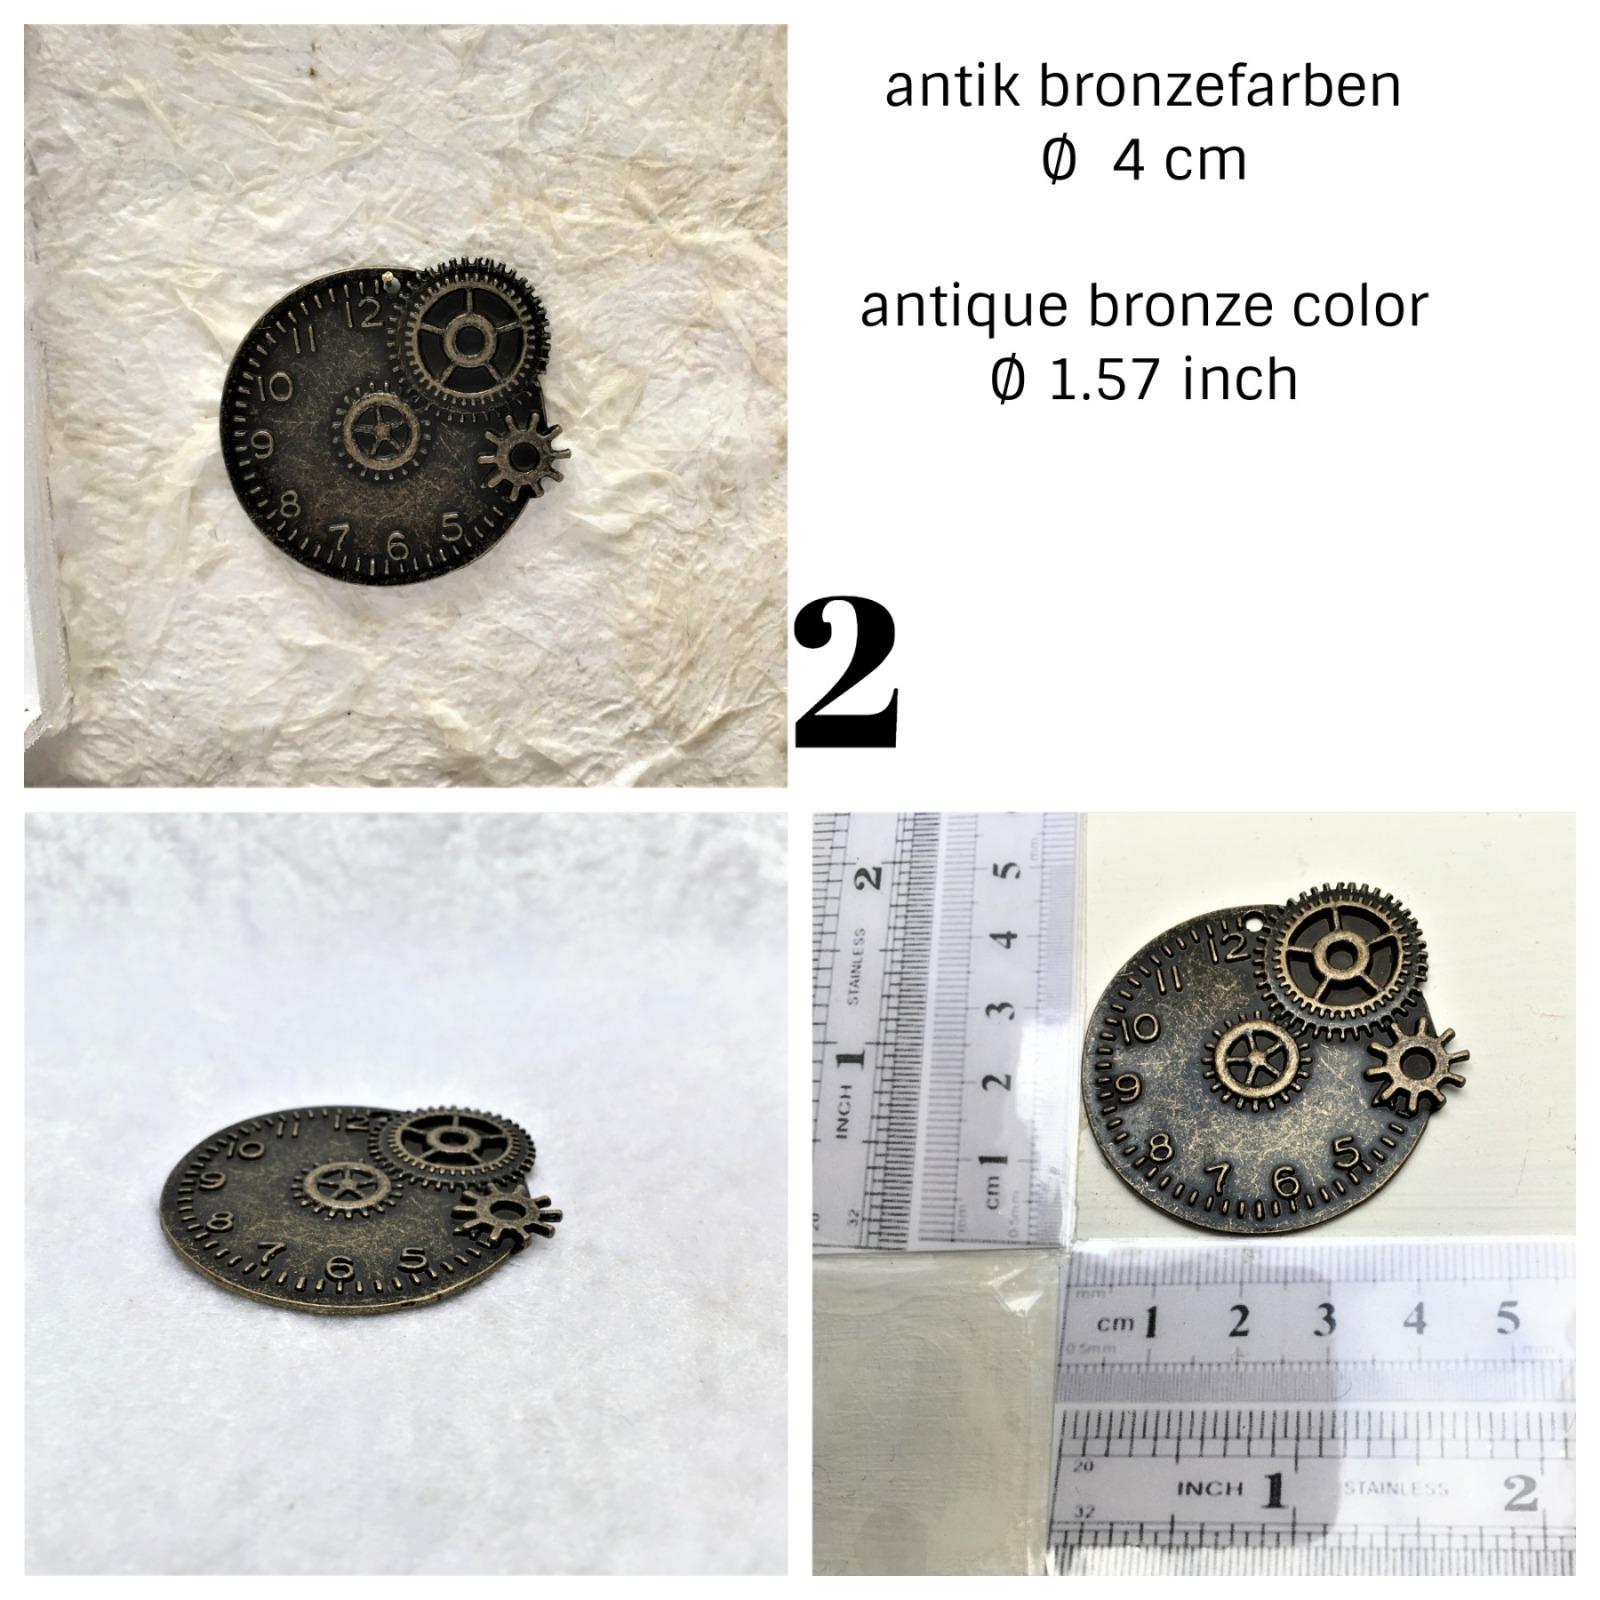 Uhren antik Bronzefarben 2